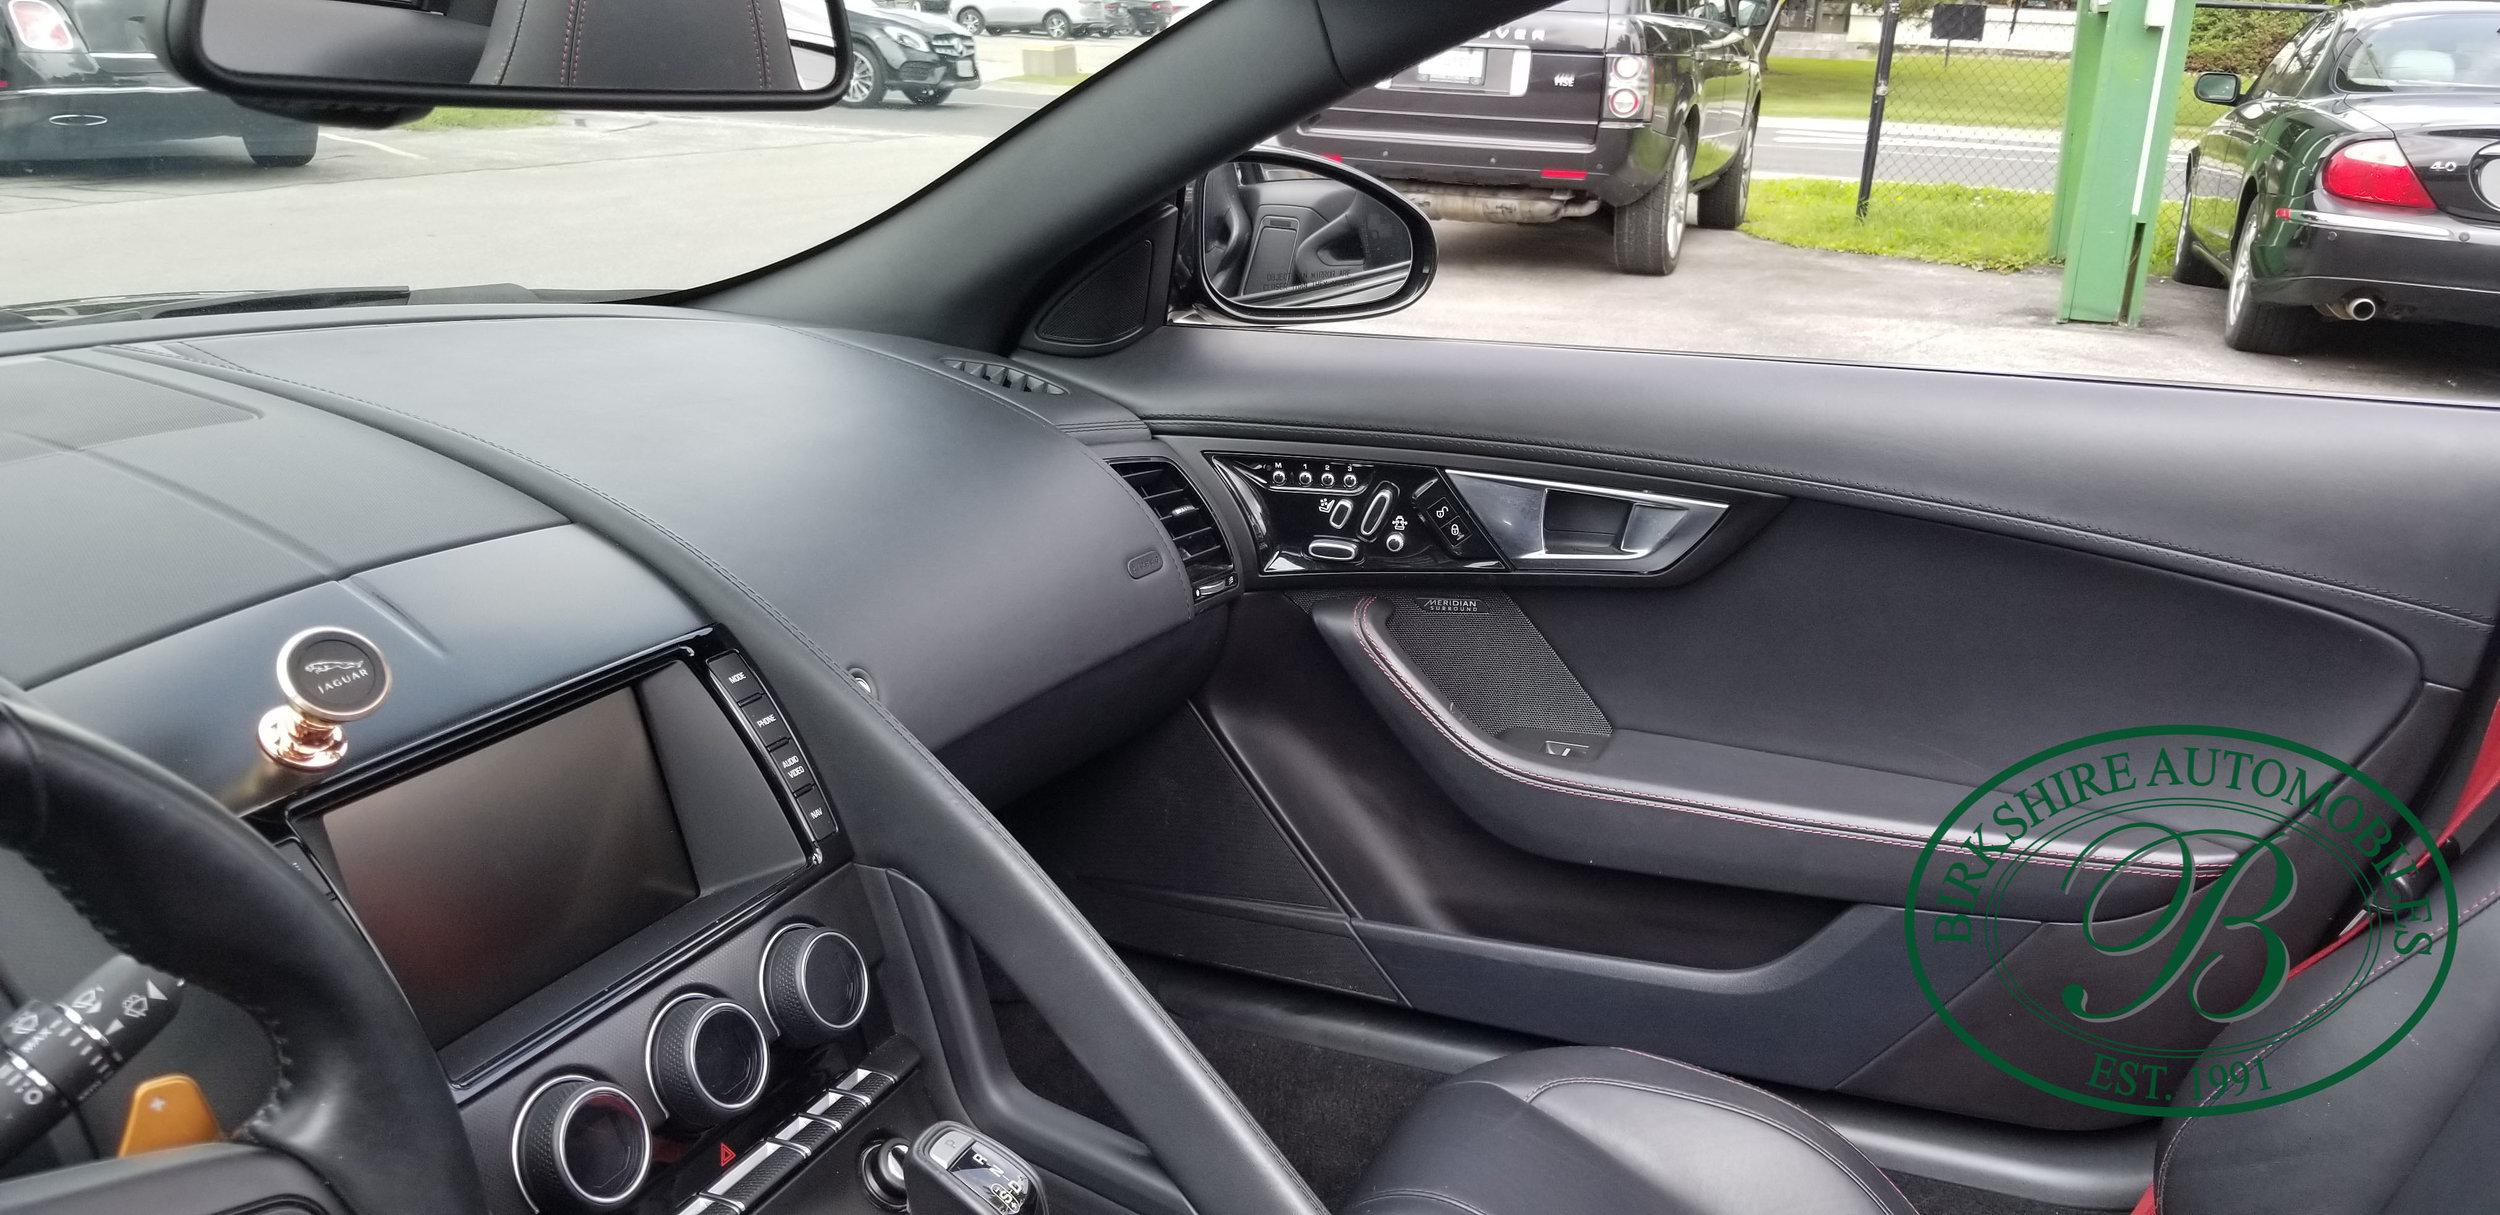 2014 F-Type V8 S - Birkshire Automobiles (76).jpg